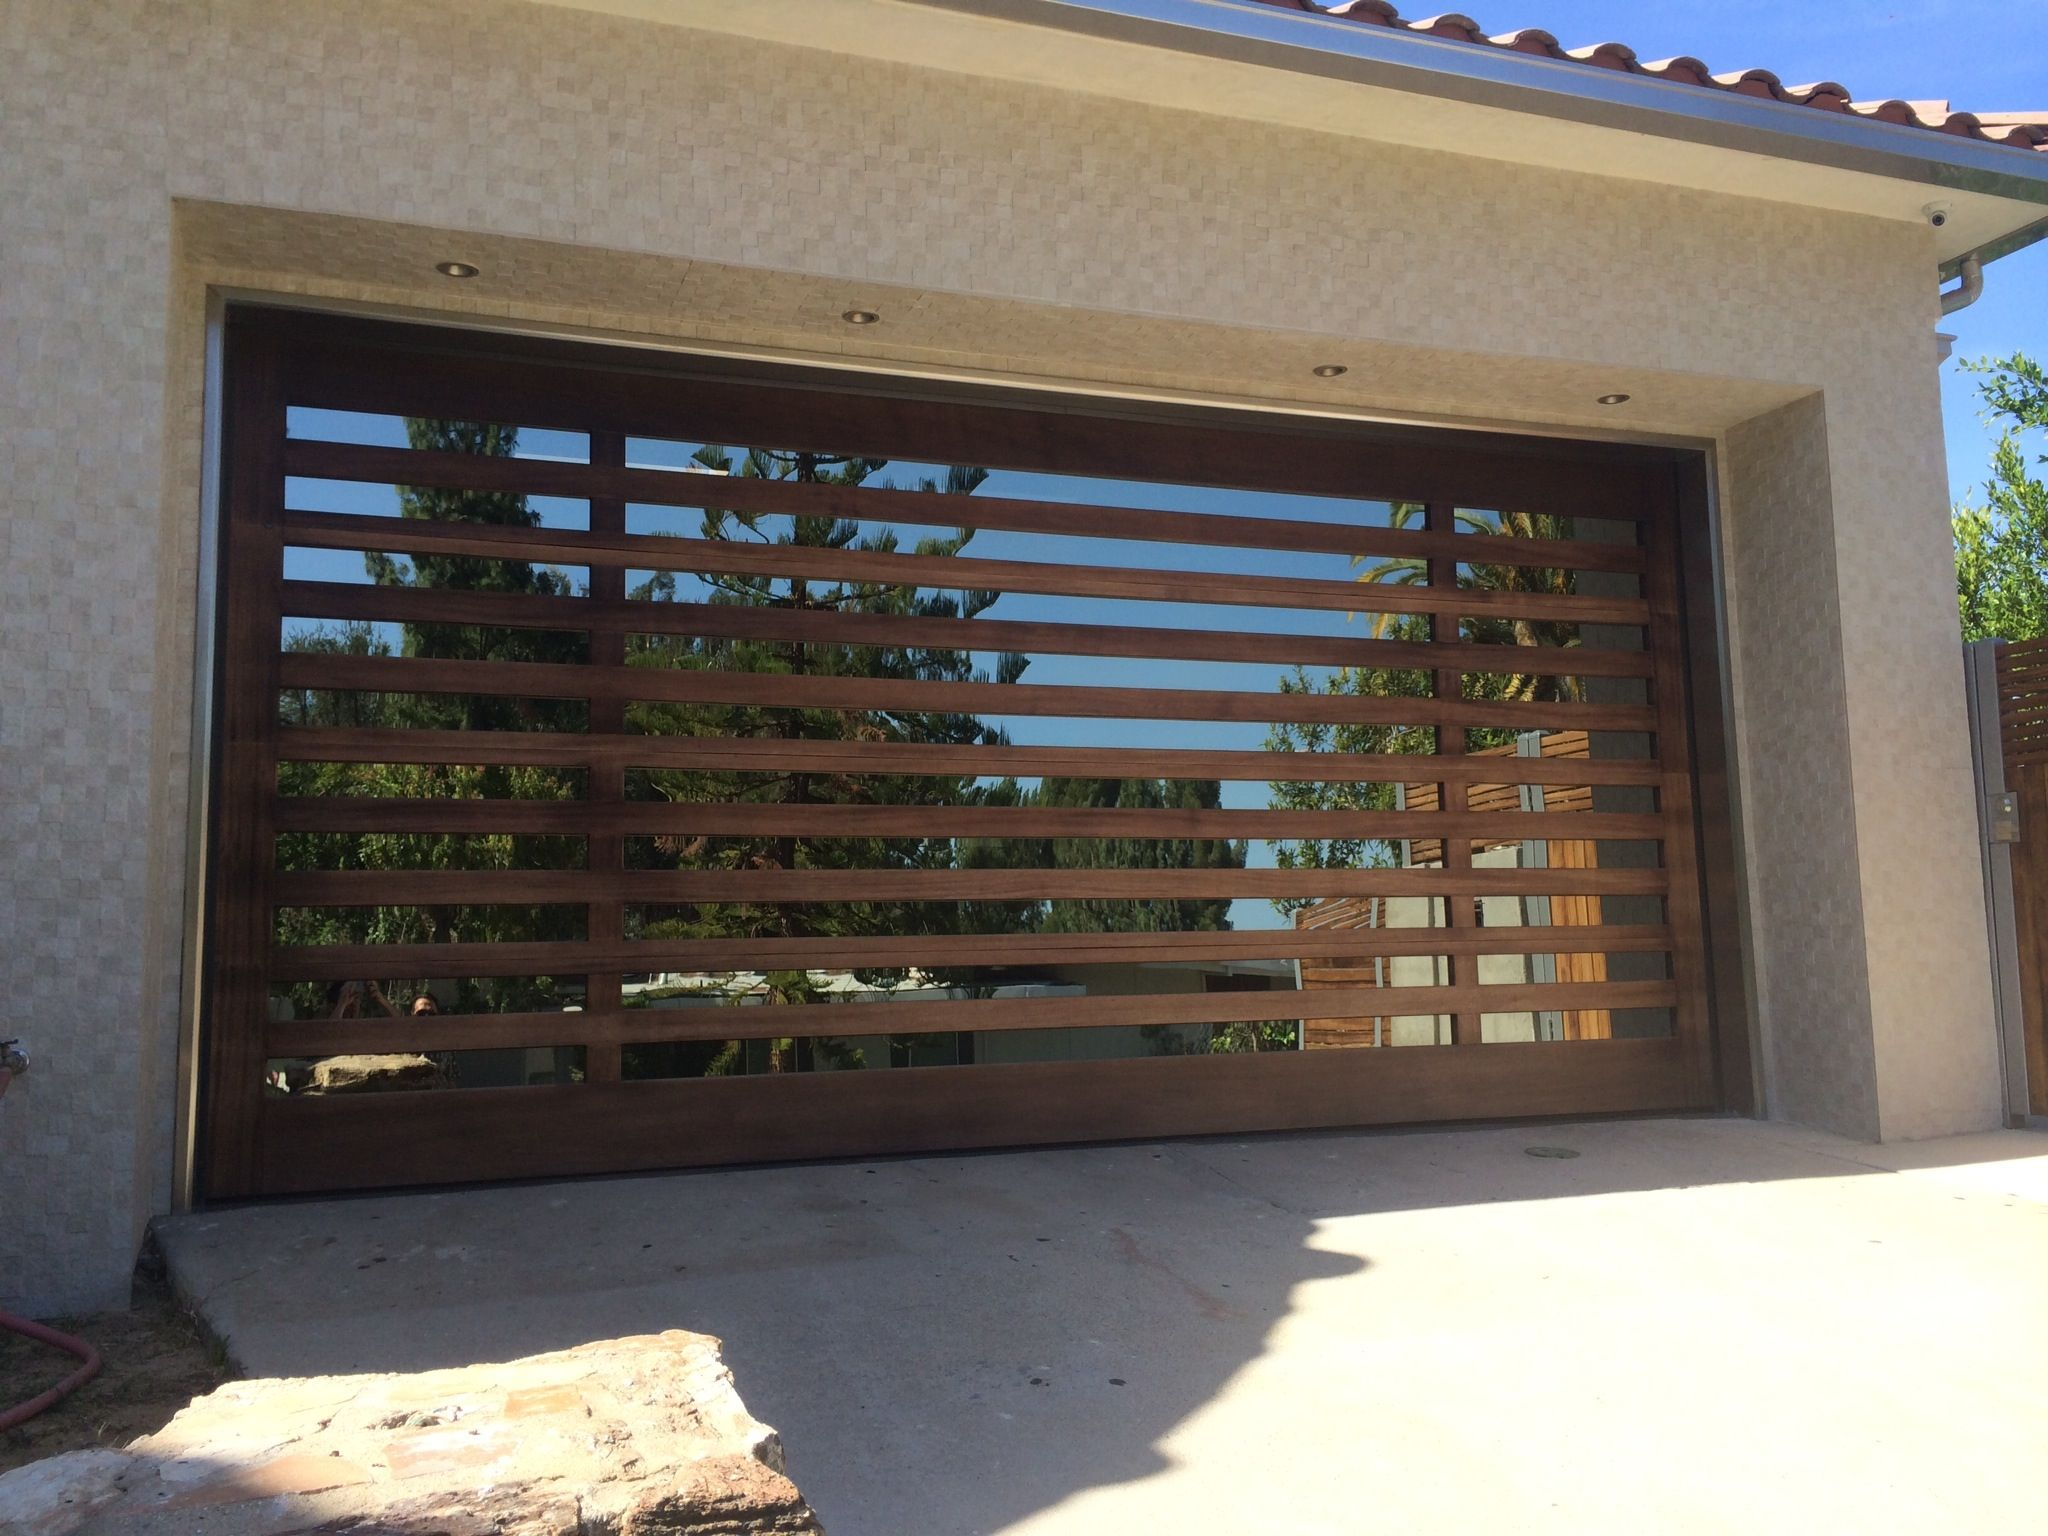 Shining Design Contemporary Garage Doors 16 Super Ideas Custom Modern Wood  Door With Privacy Glass Tungsten Roycejpg